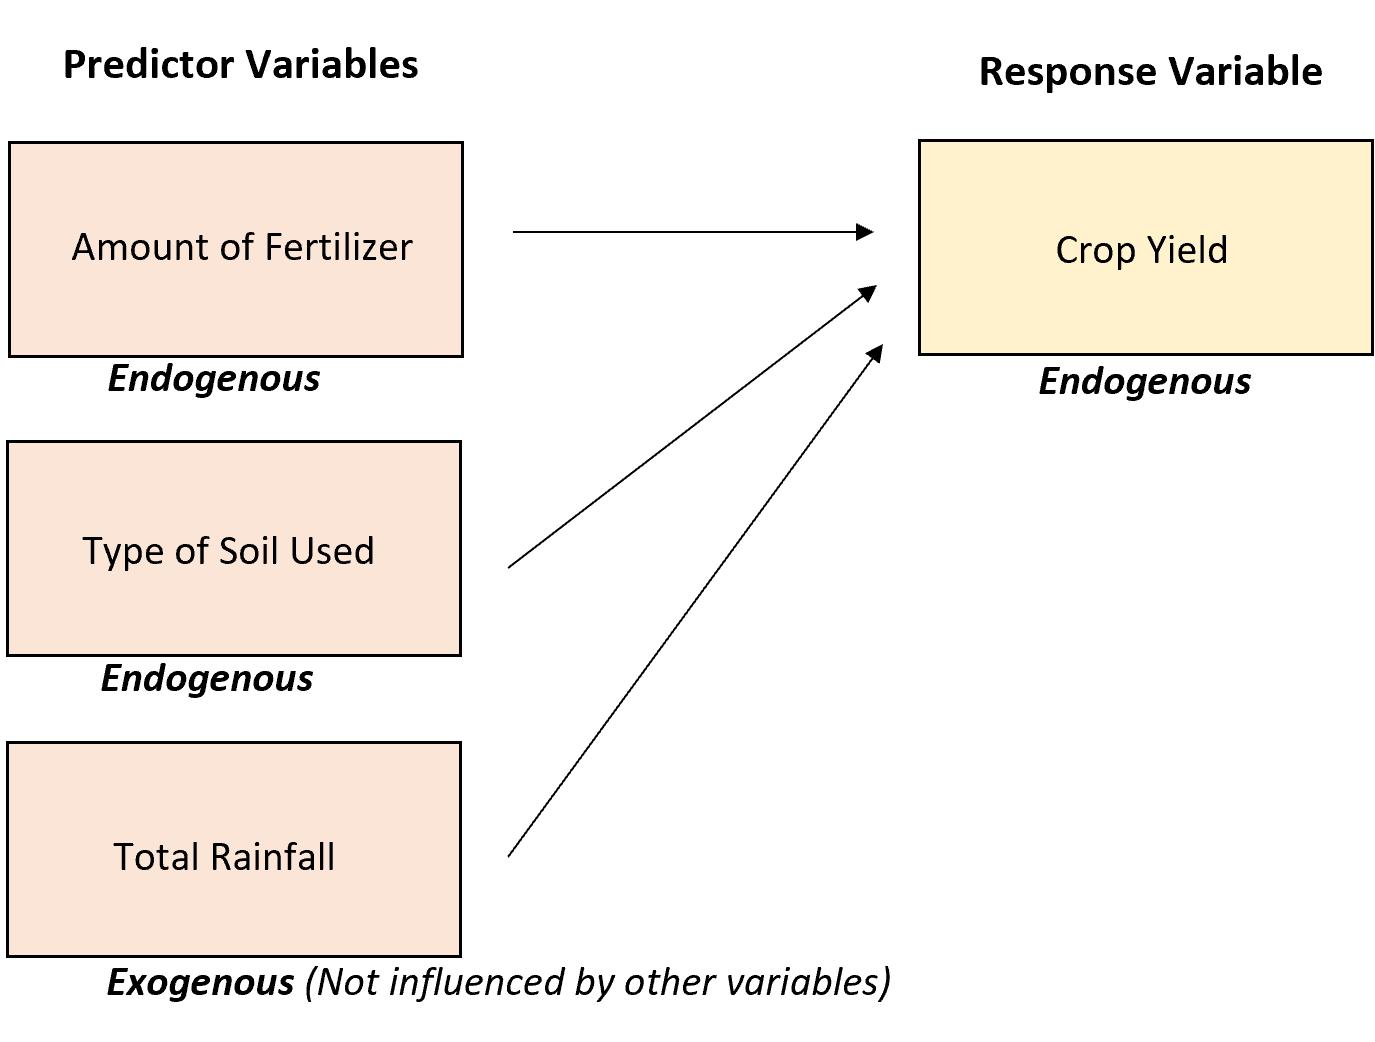 Endogenous vs. exogenous variables